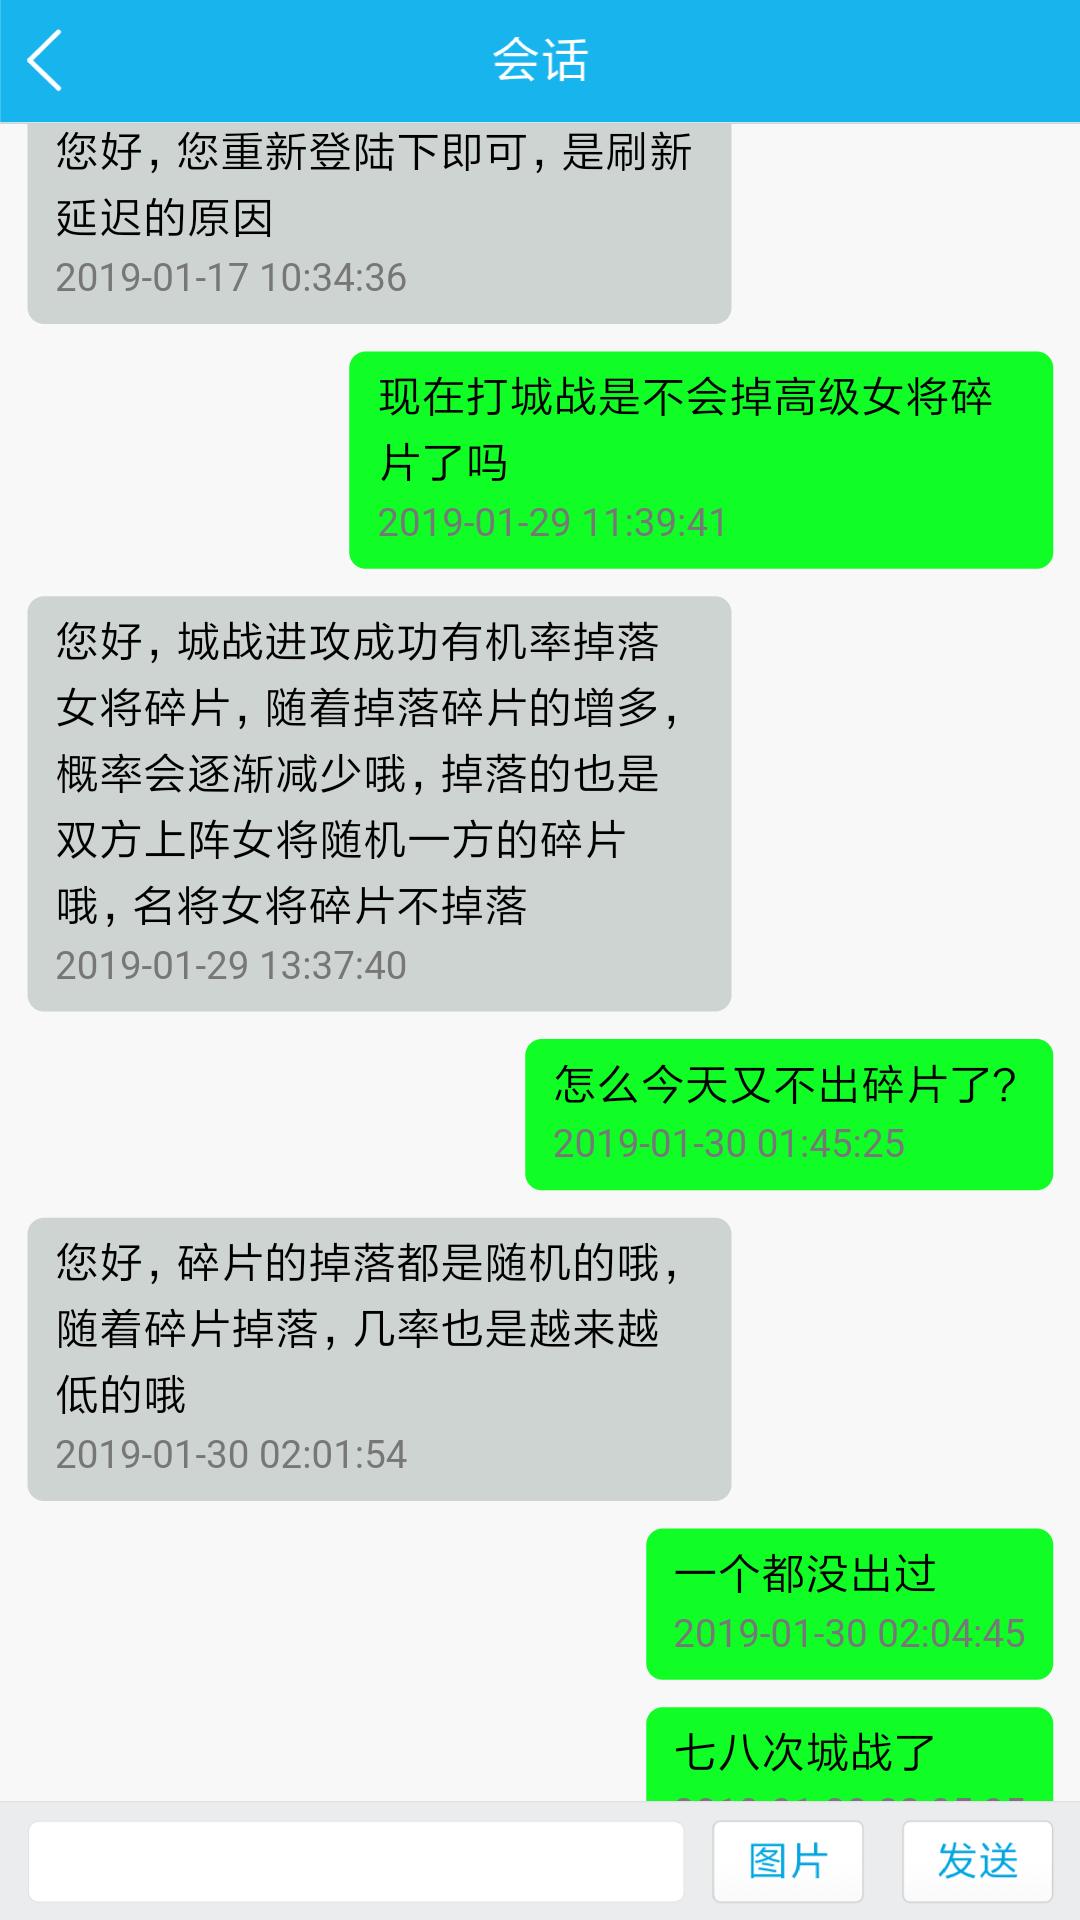 Screenshot_2019-01-31-01-26-41-067_com.jedigames.p16.mi.png